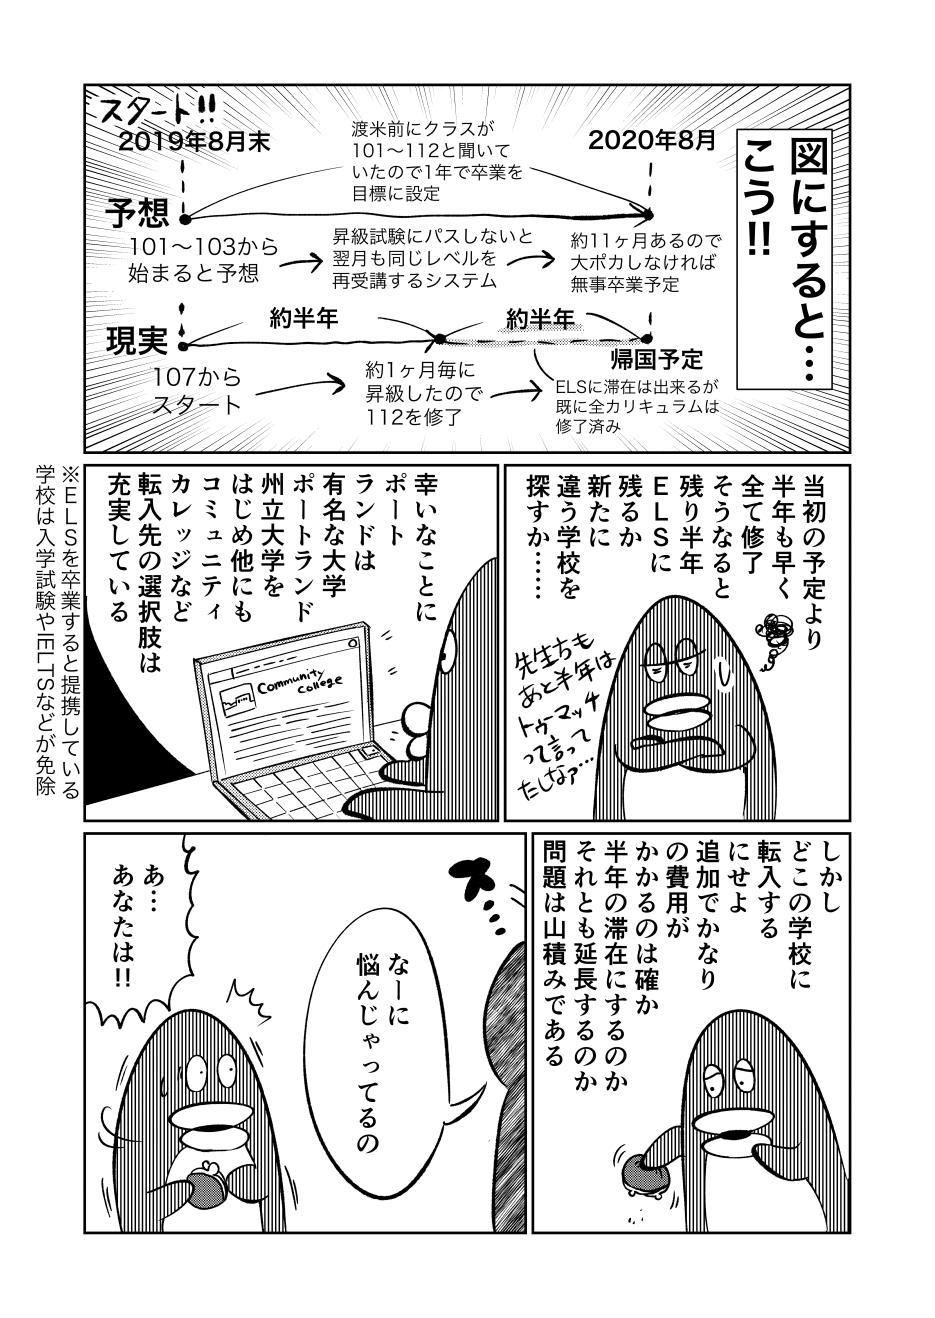 https://www.ryugaku.co.jp/blog/els_portland/upload/1302.jpg